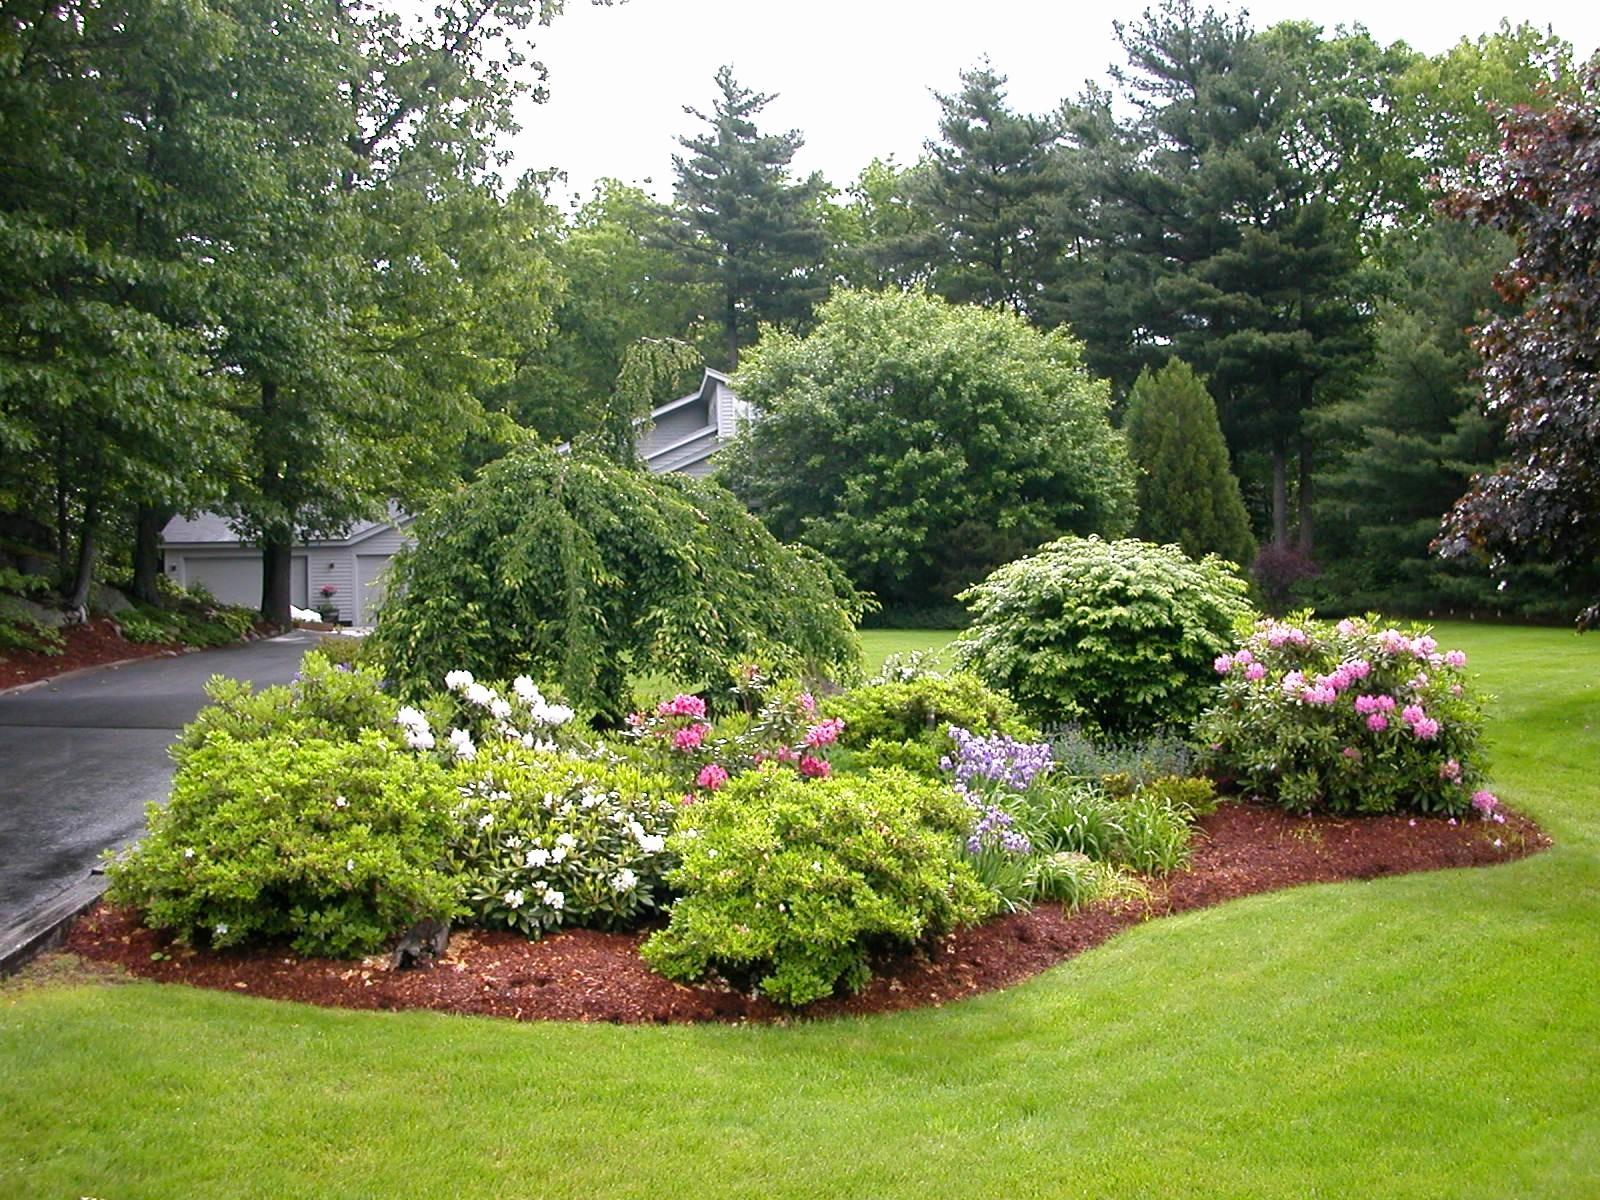 evergreen landscaping style ideas AMALOVS